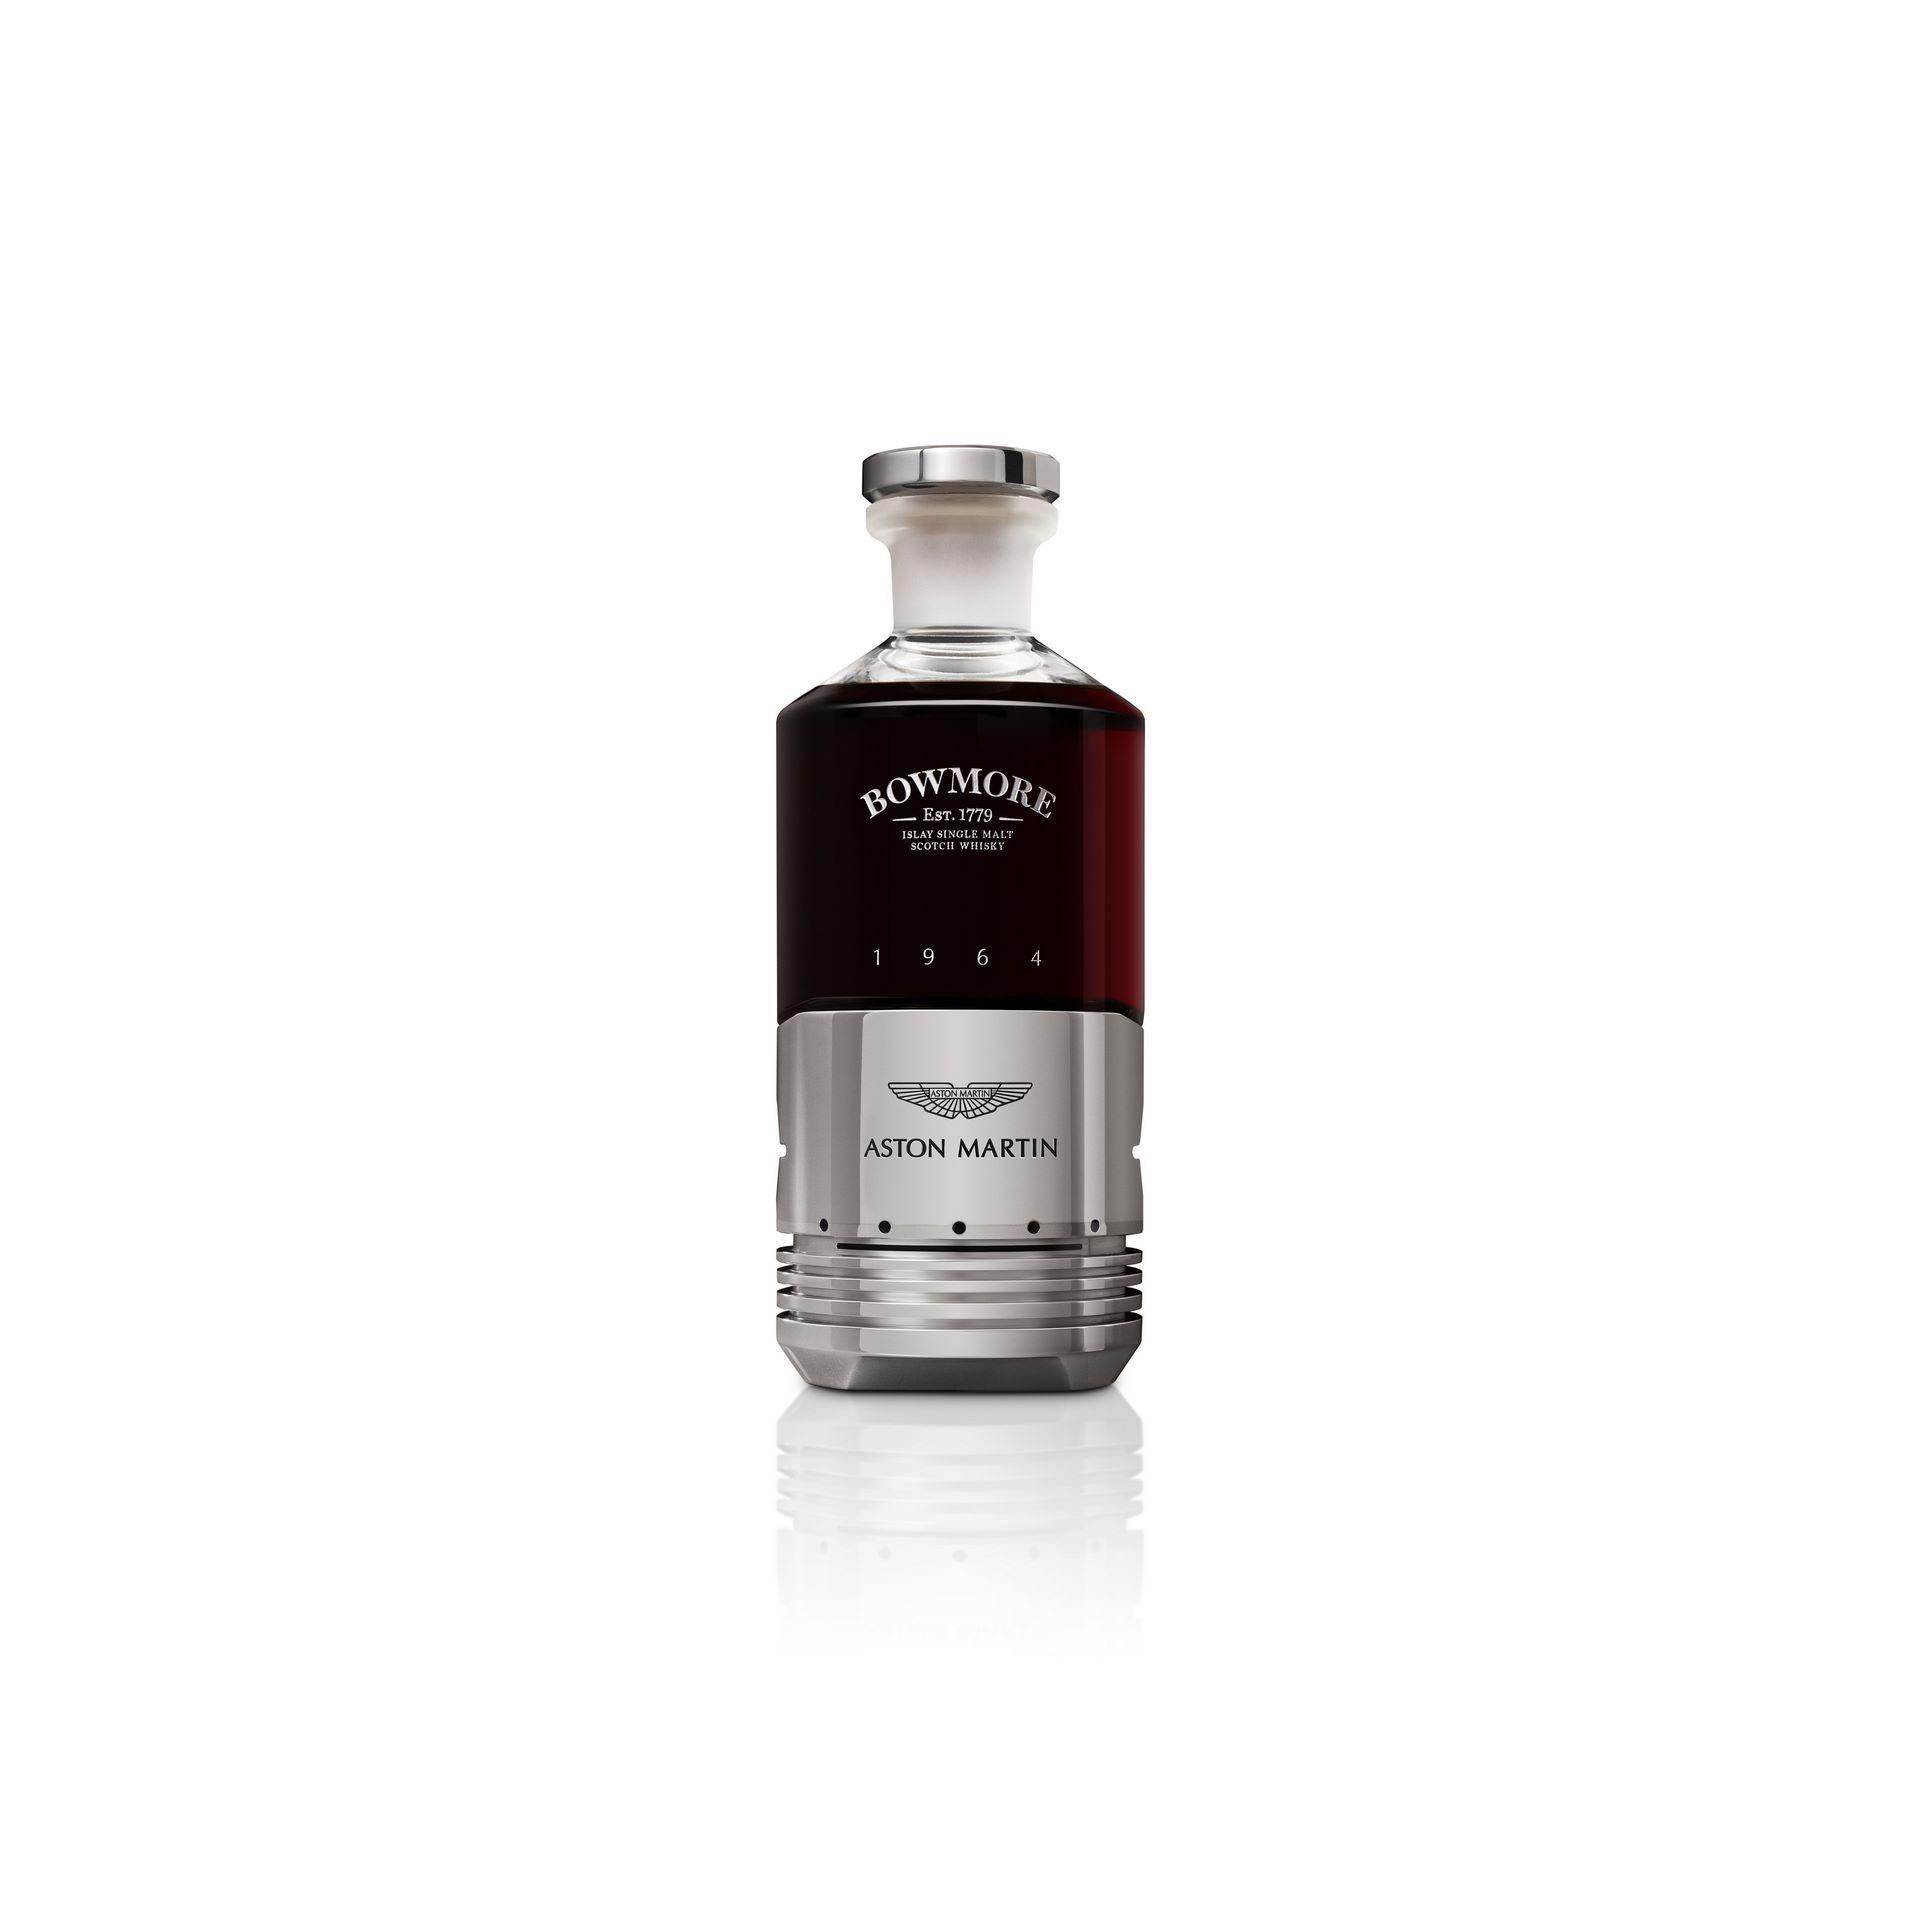 Black-Bowmore-Aston-Martin-DB5-1964-Whisky-5